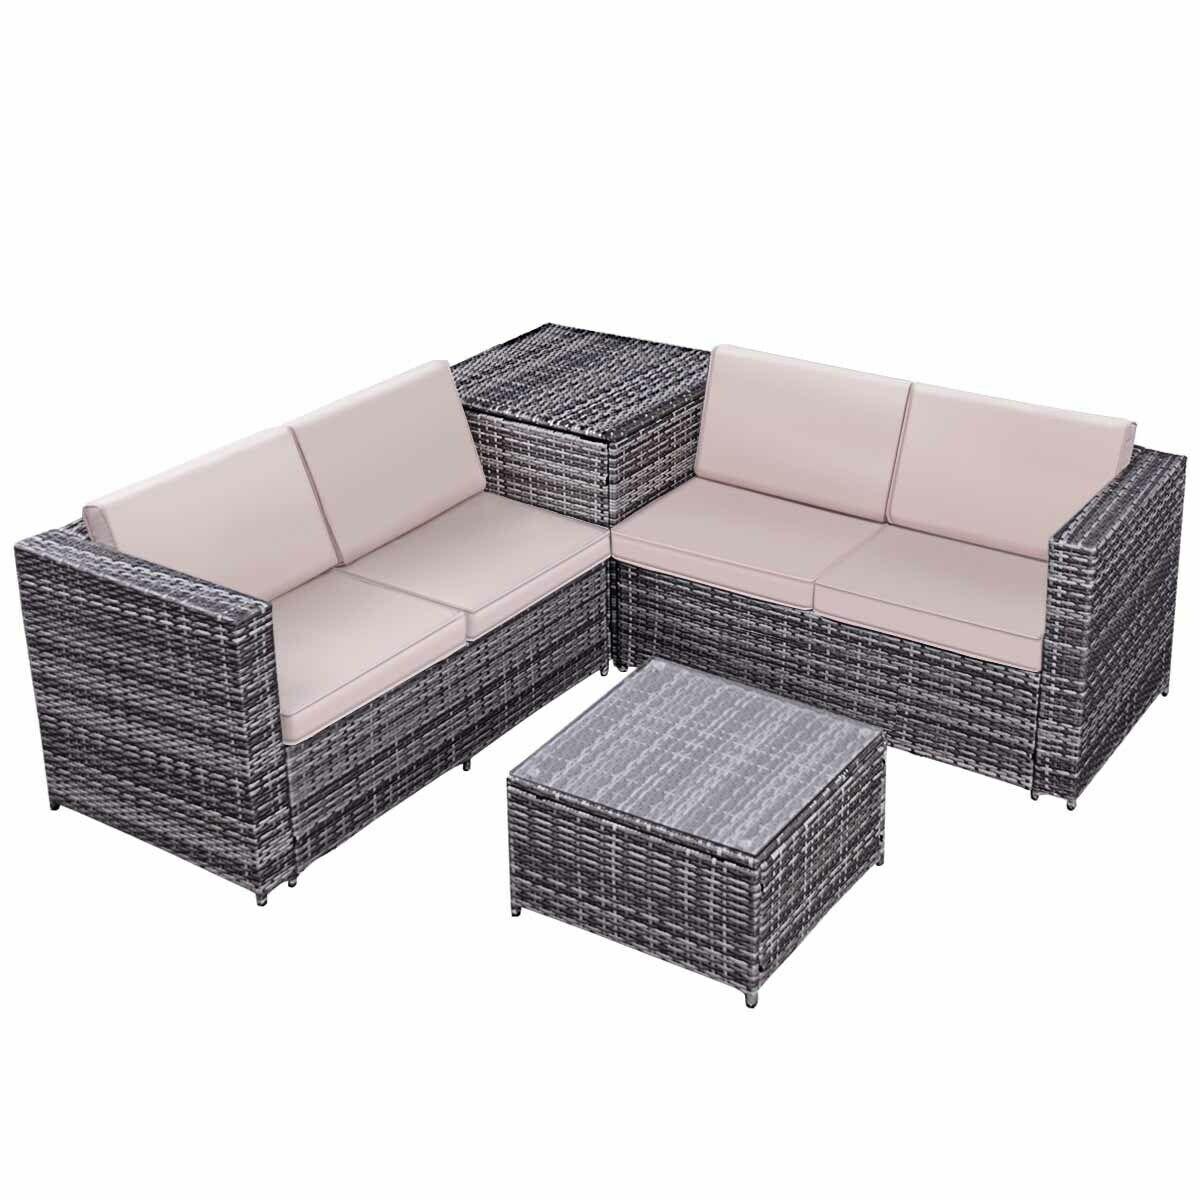 4 pcs Rattan Wicker Furniture Set with Storage Box